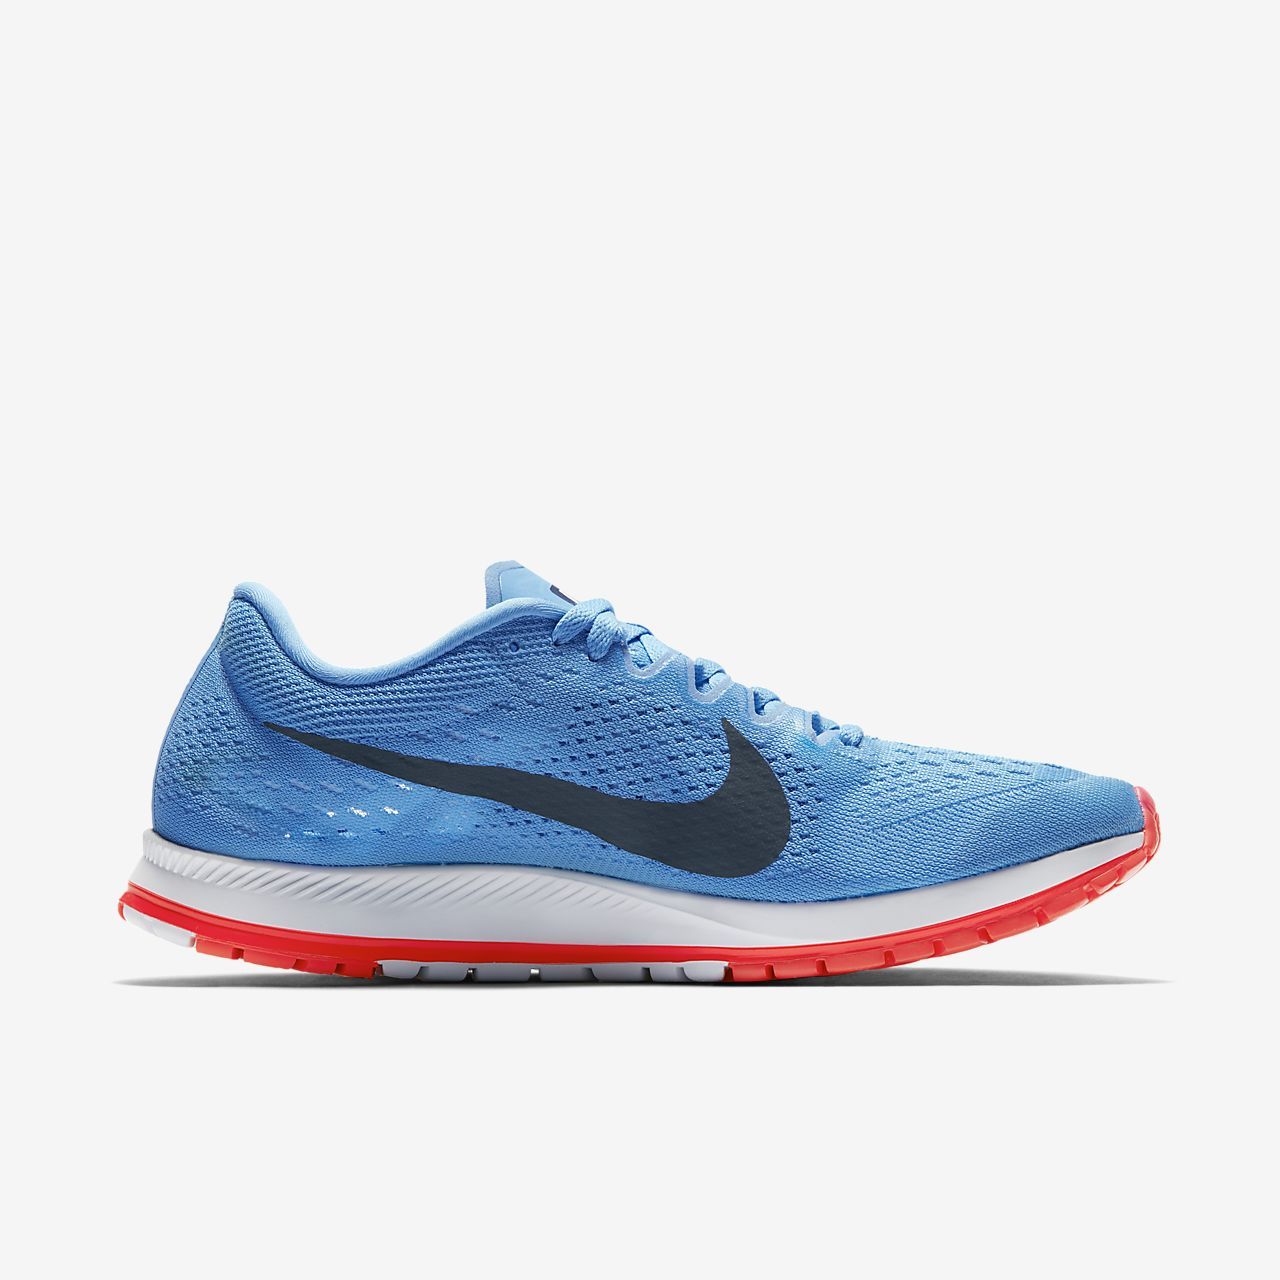 Nike Zoom Streak  Unisex Racing Shoe